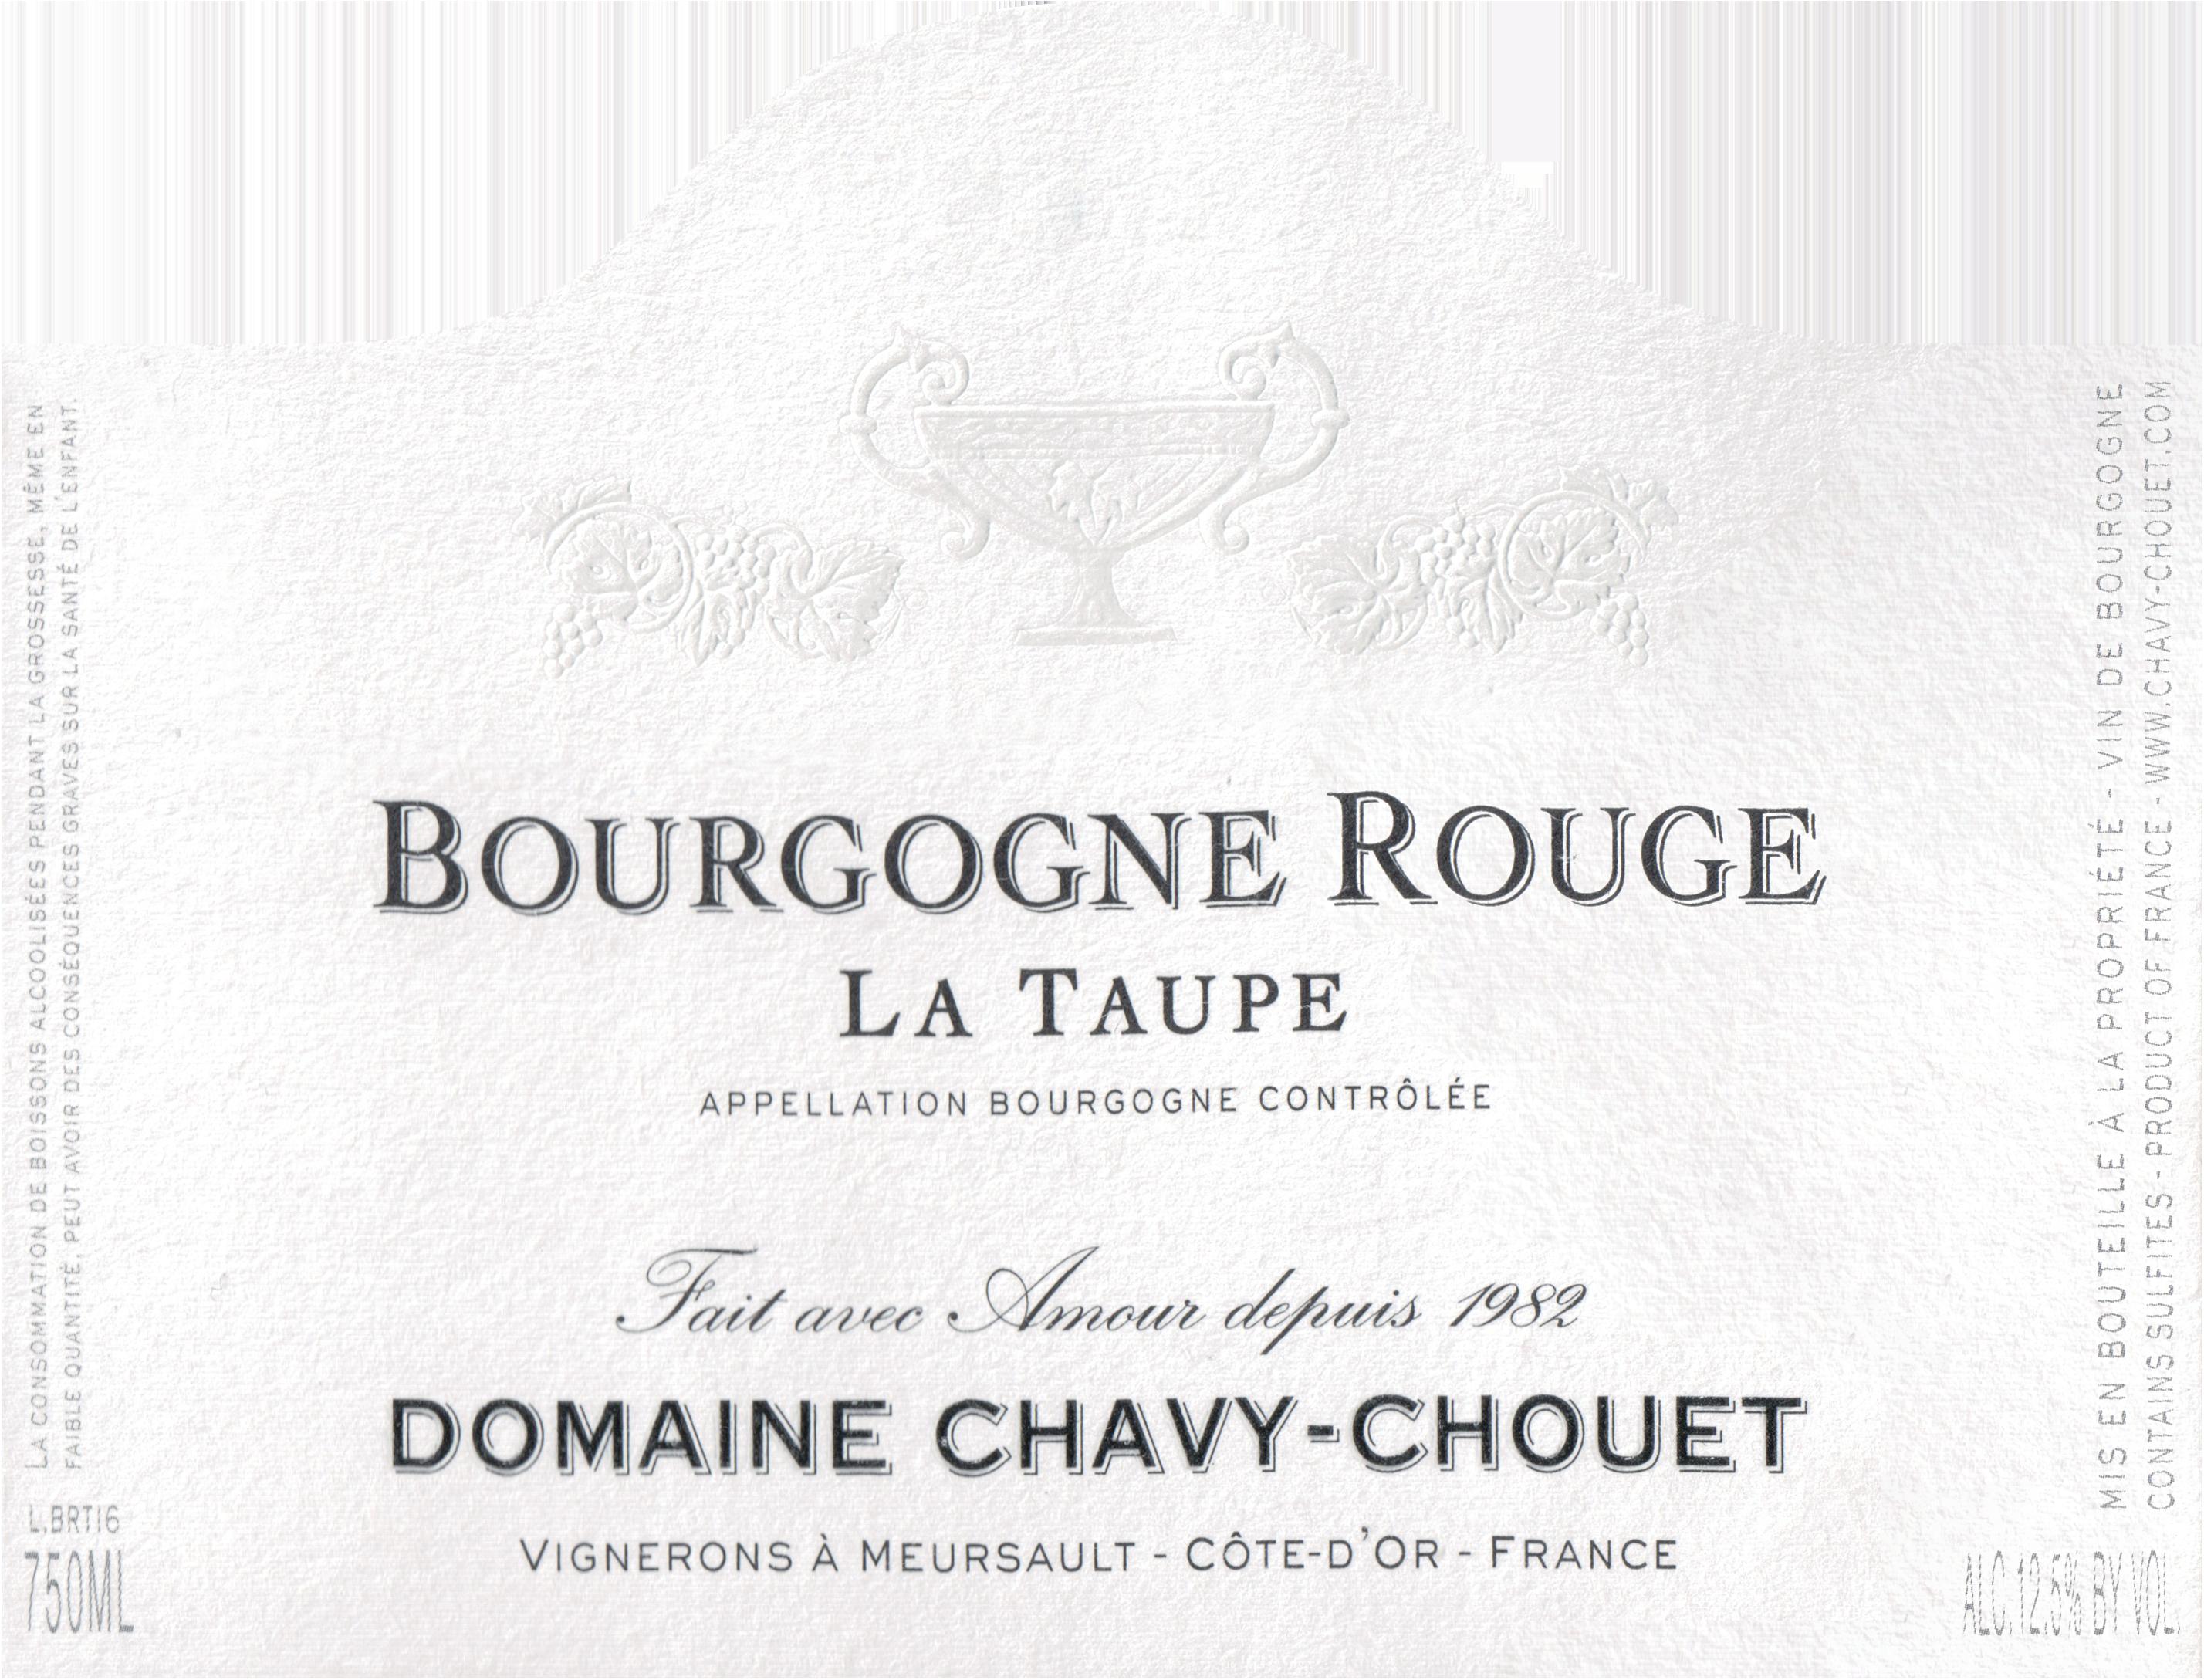 """Chavy Chouet Bourgogne """"La Taupe"""" Rouge 2017"""